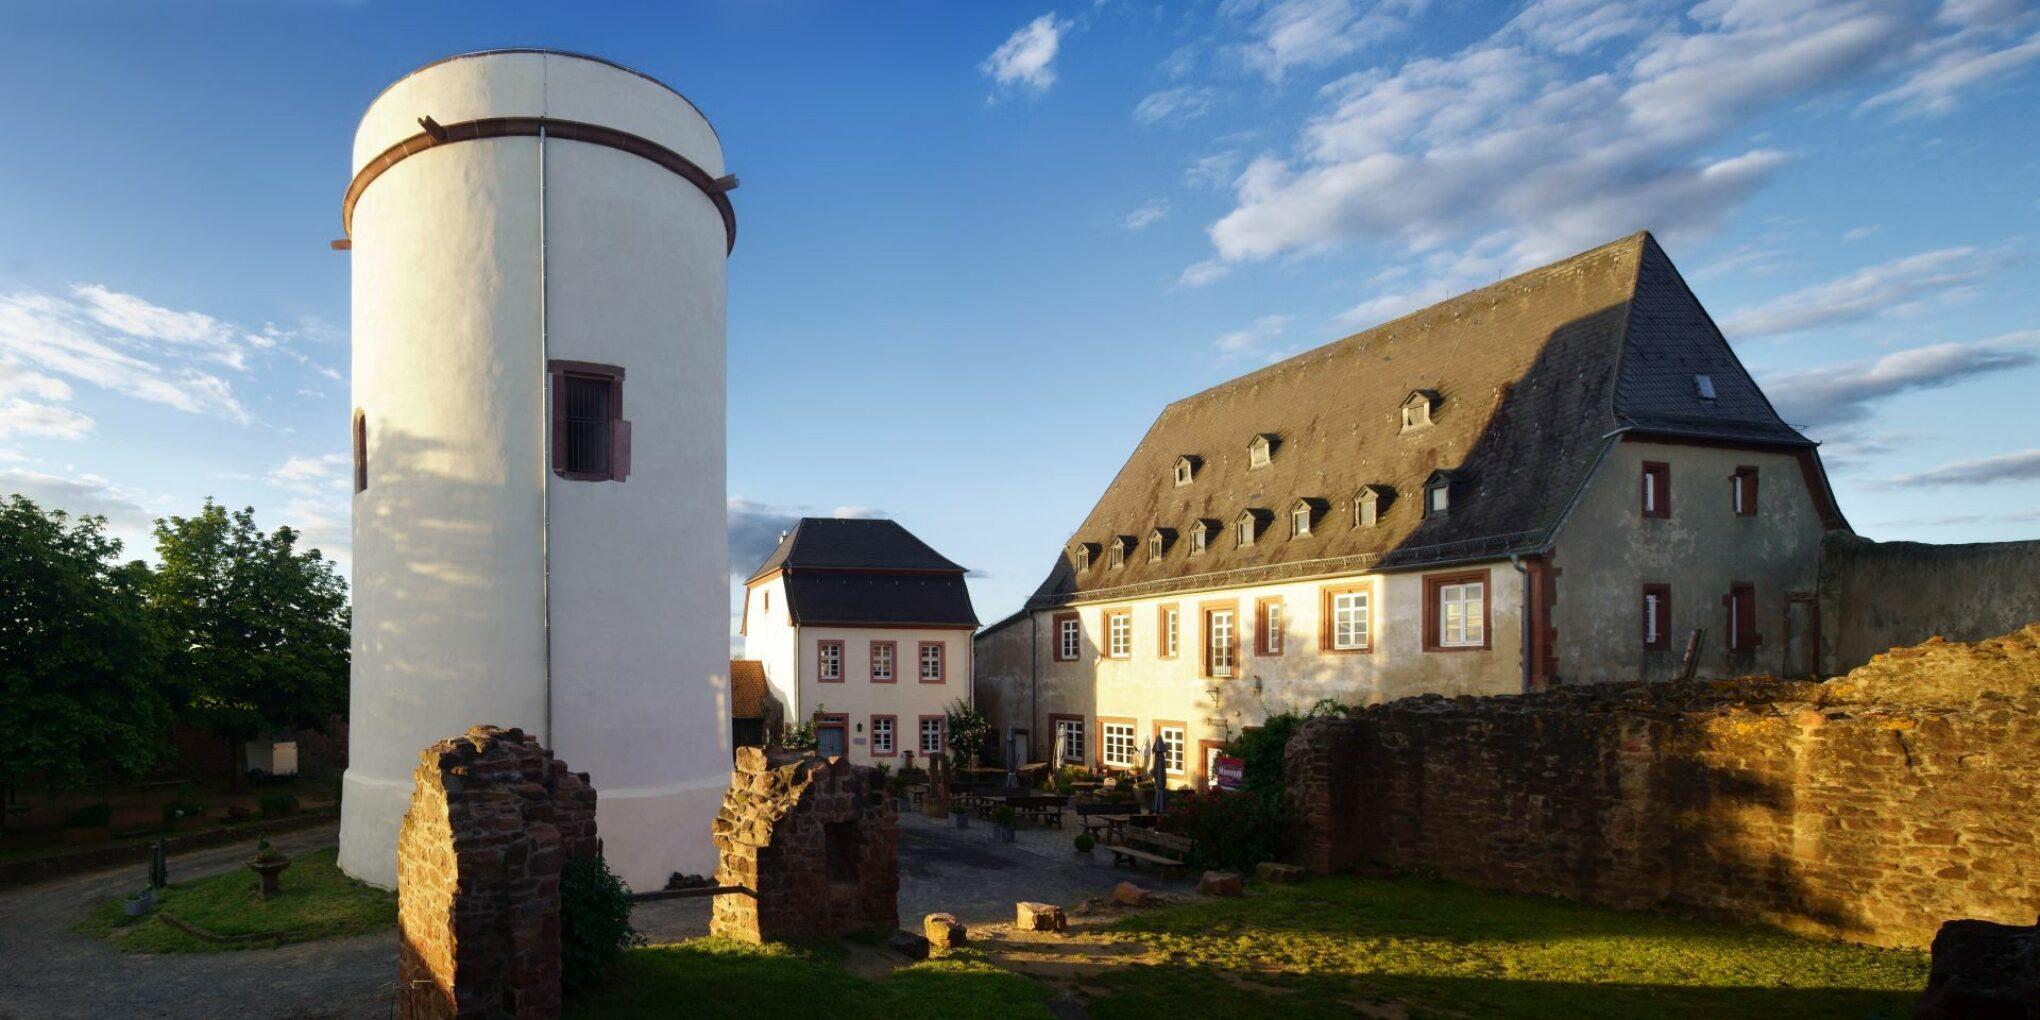 Veste Otzberg, Bergfried und Kommandantenhaus